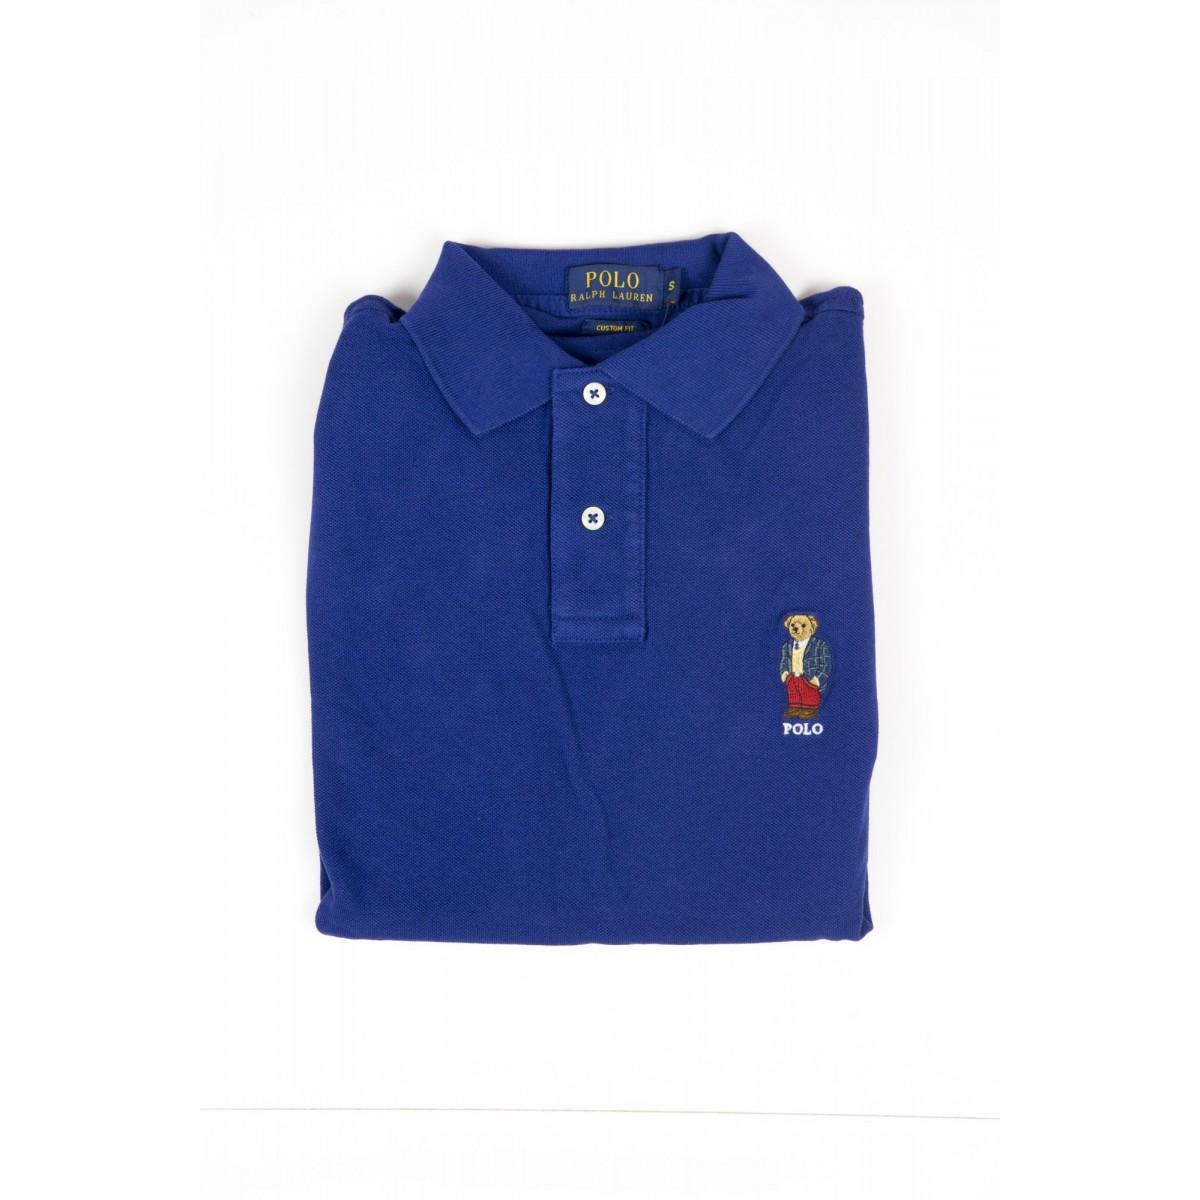 Polo Ralph Lauren Herren - A12Kj646C8312 A497H - BLU